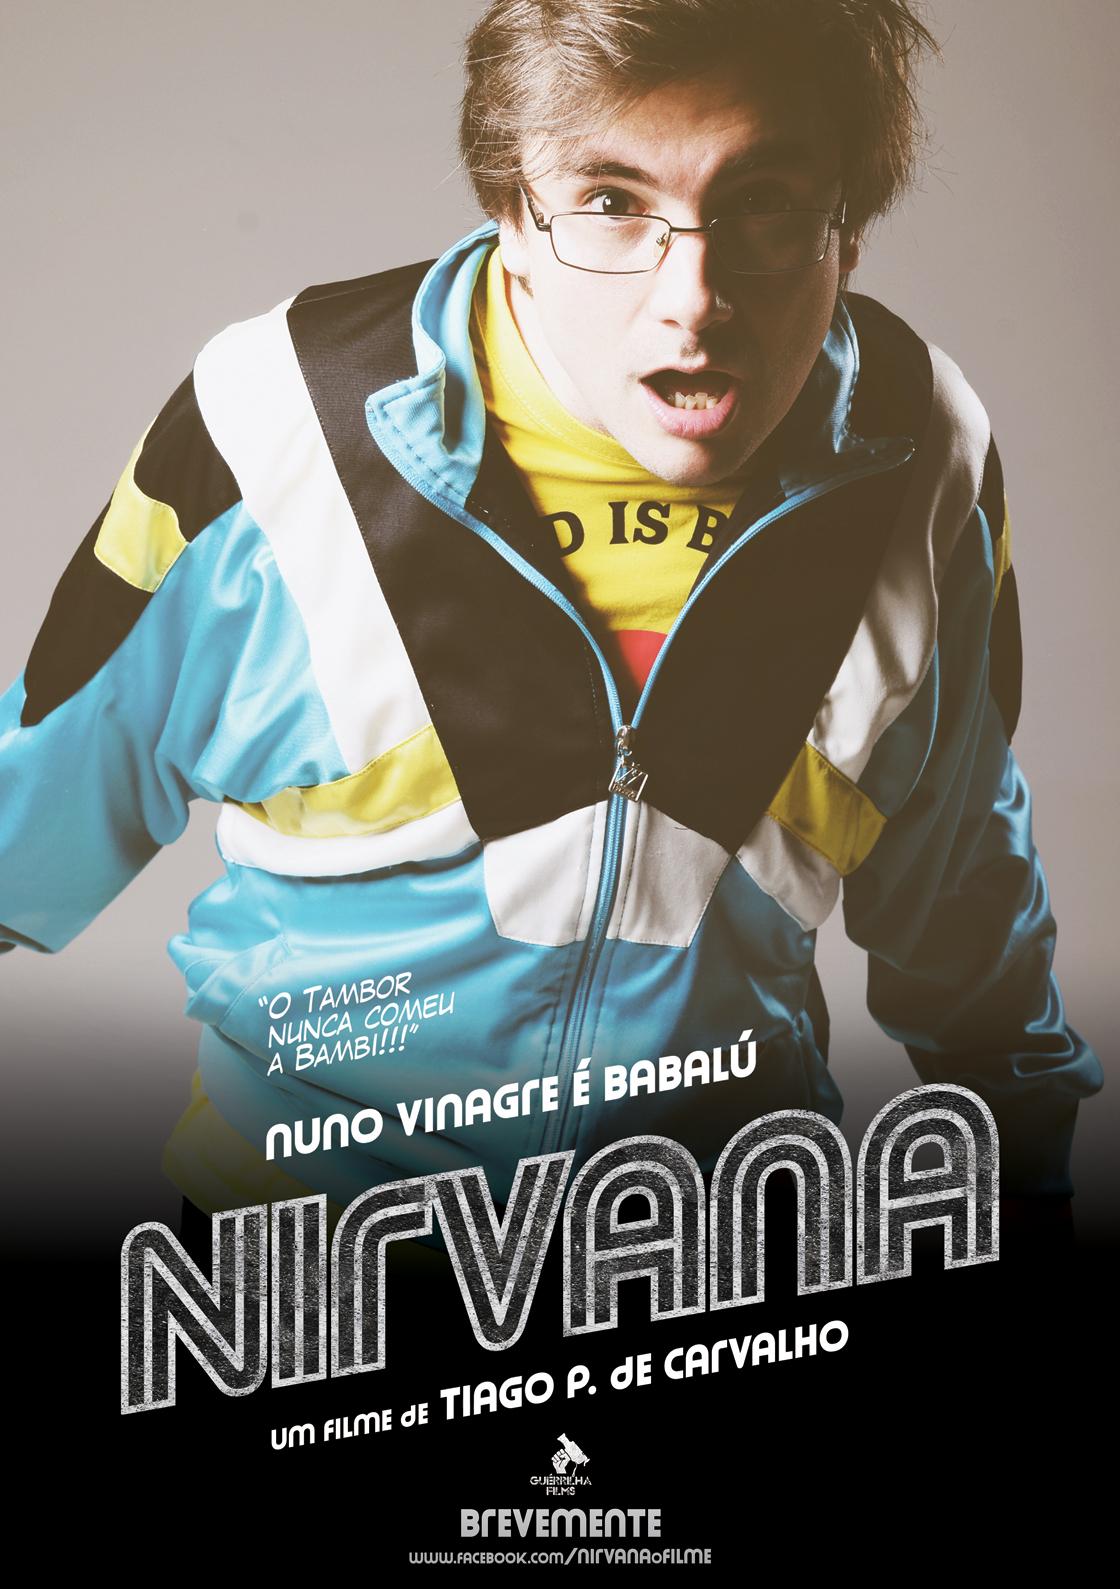 PRINT01_Nirvana06